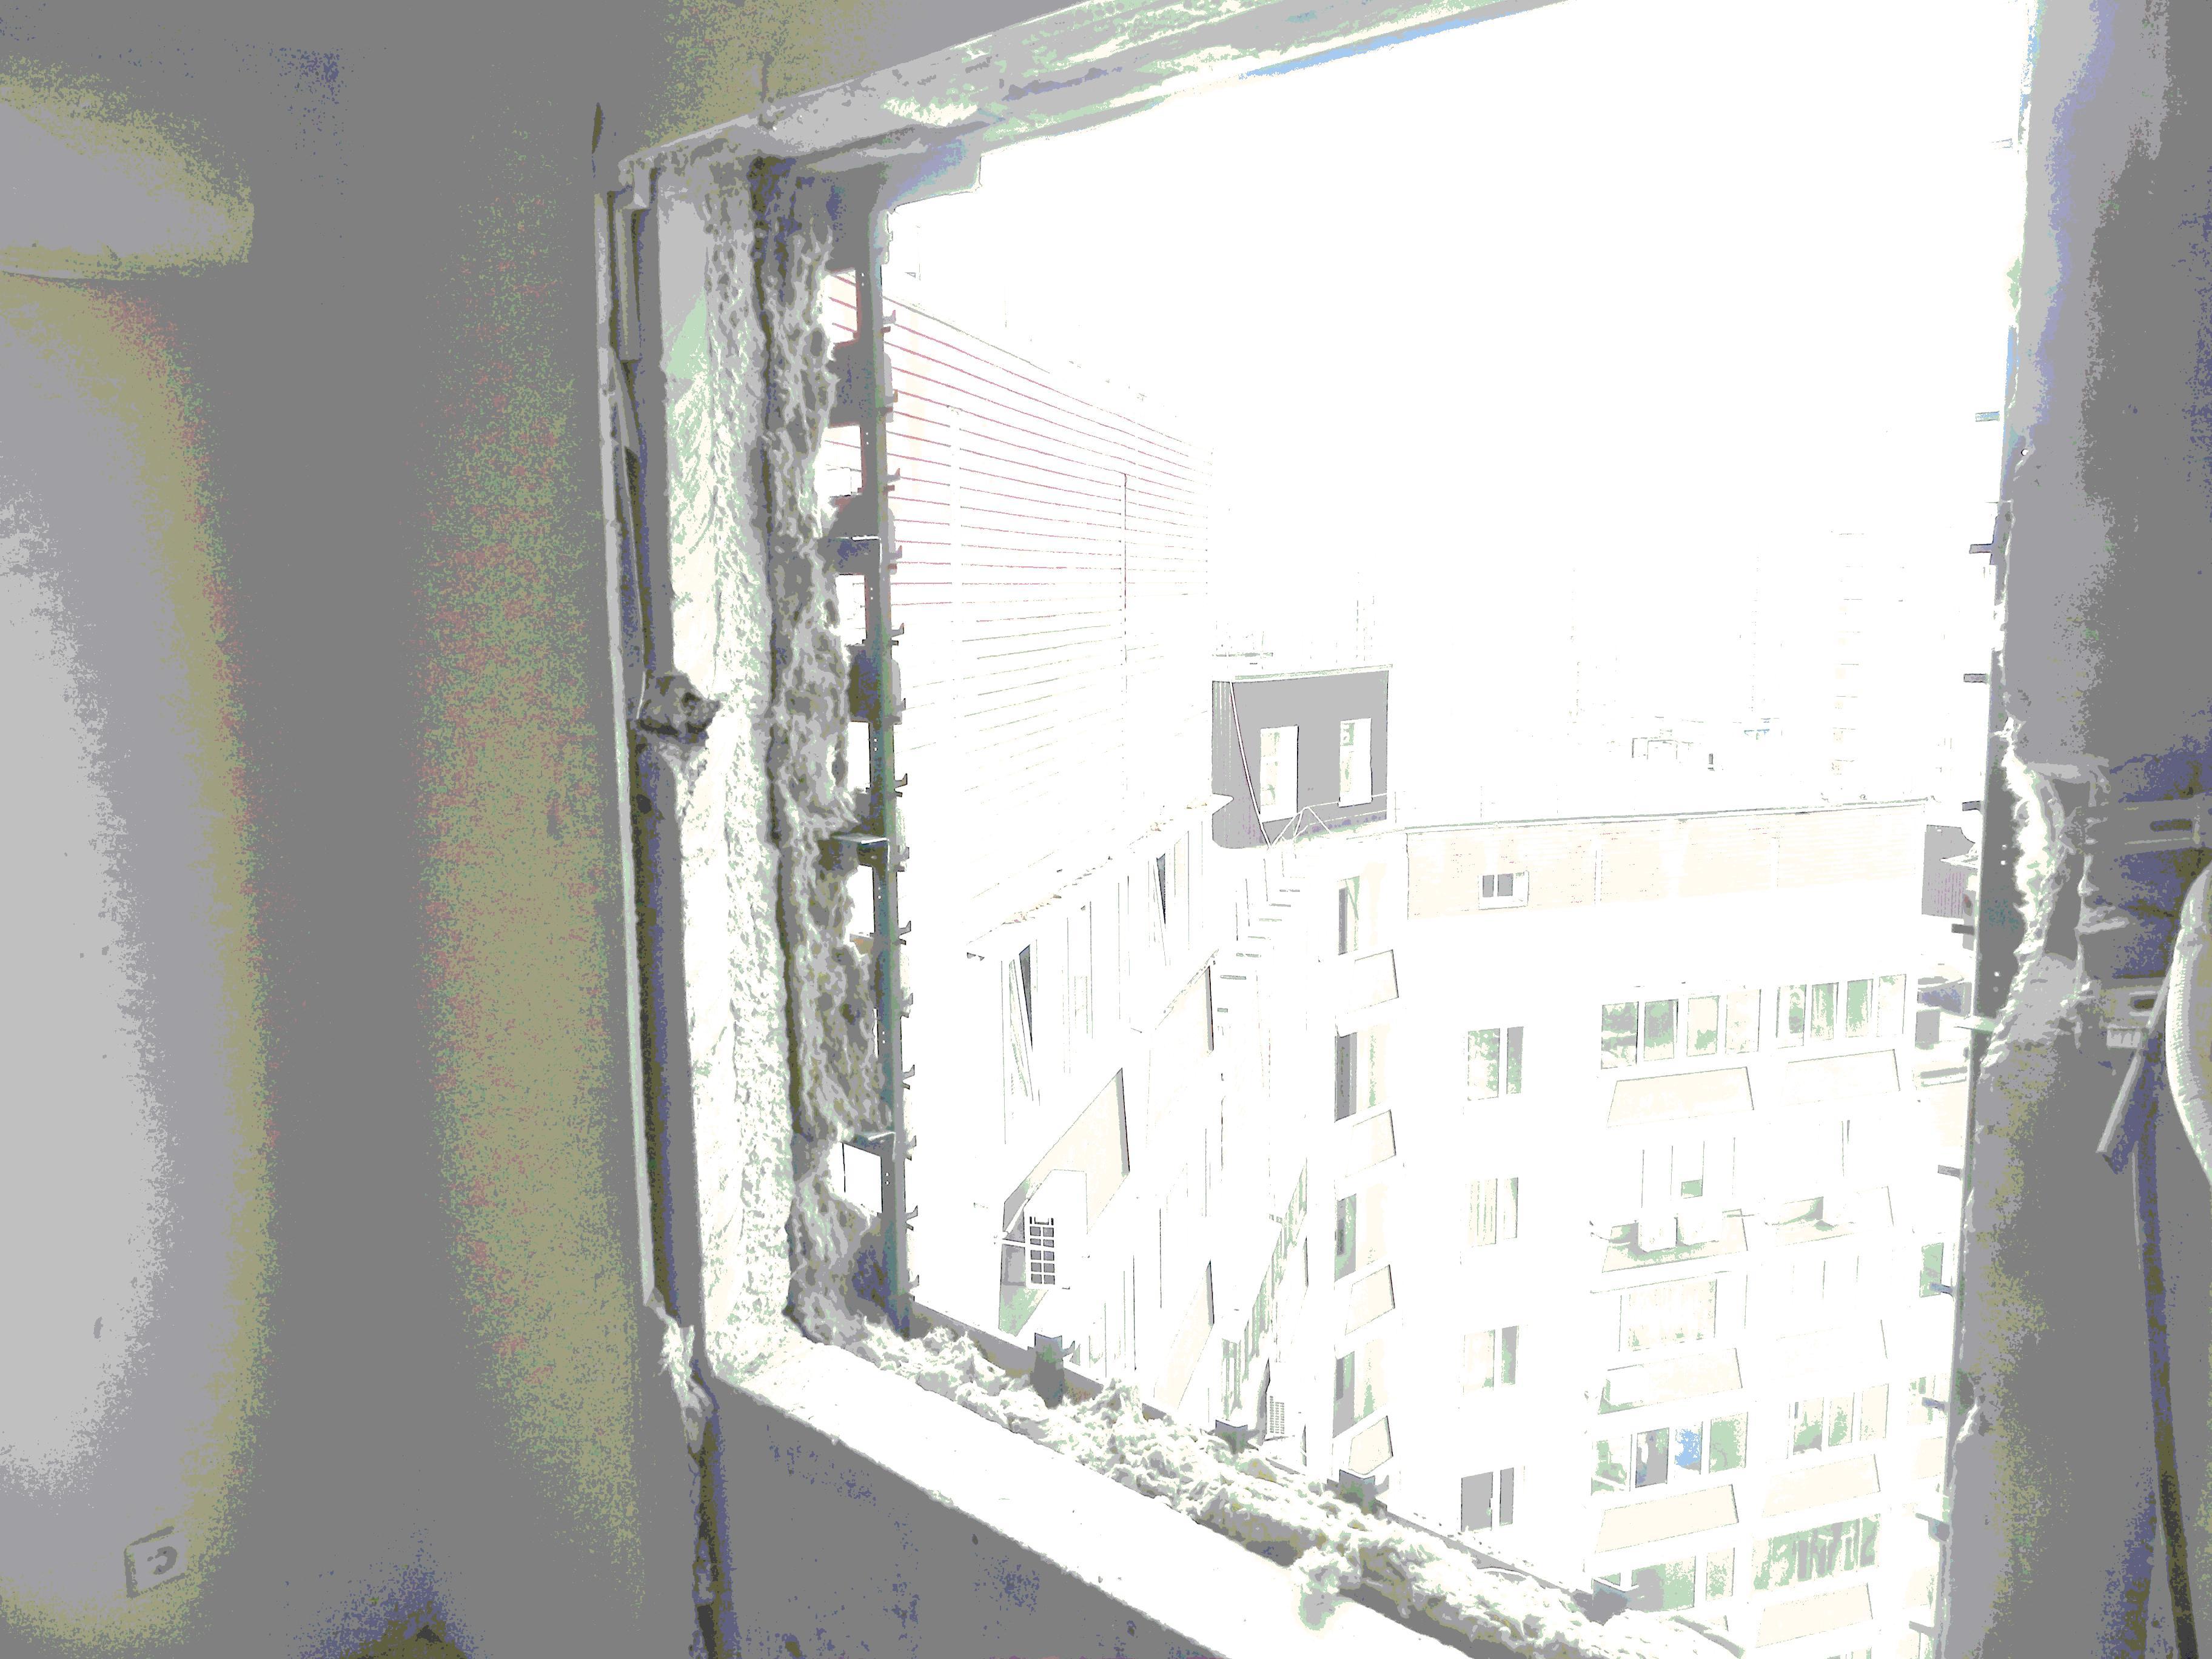 резка монолита, Резка бетона, резка железобетона, демонтаж бетона, бурение отверстий в стенах